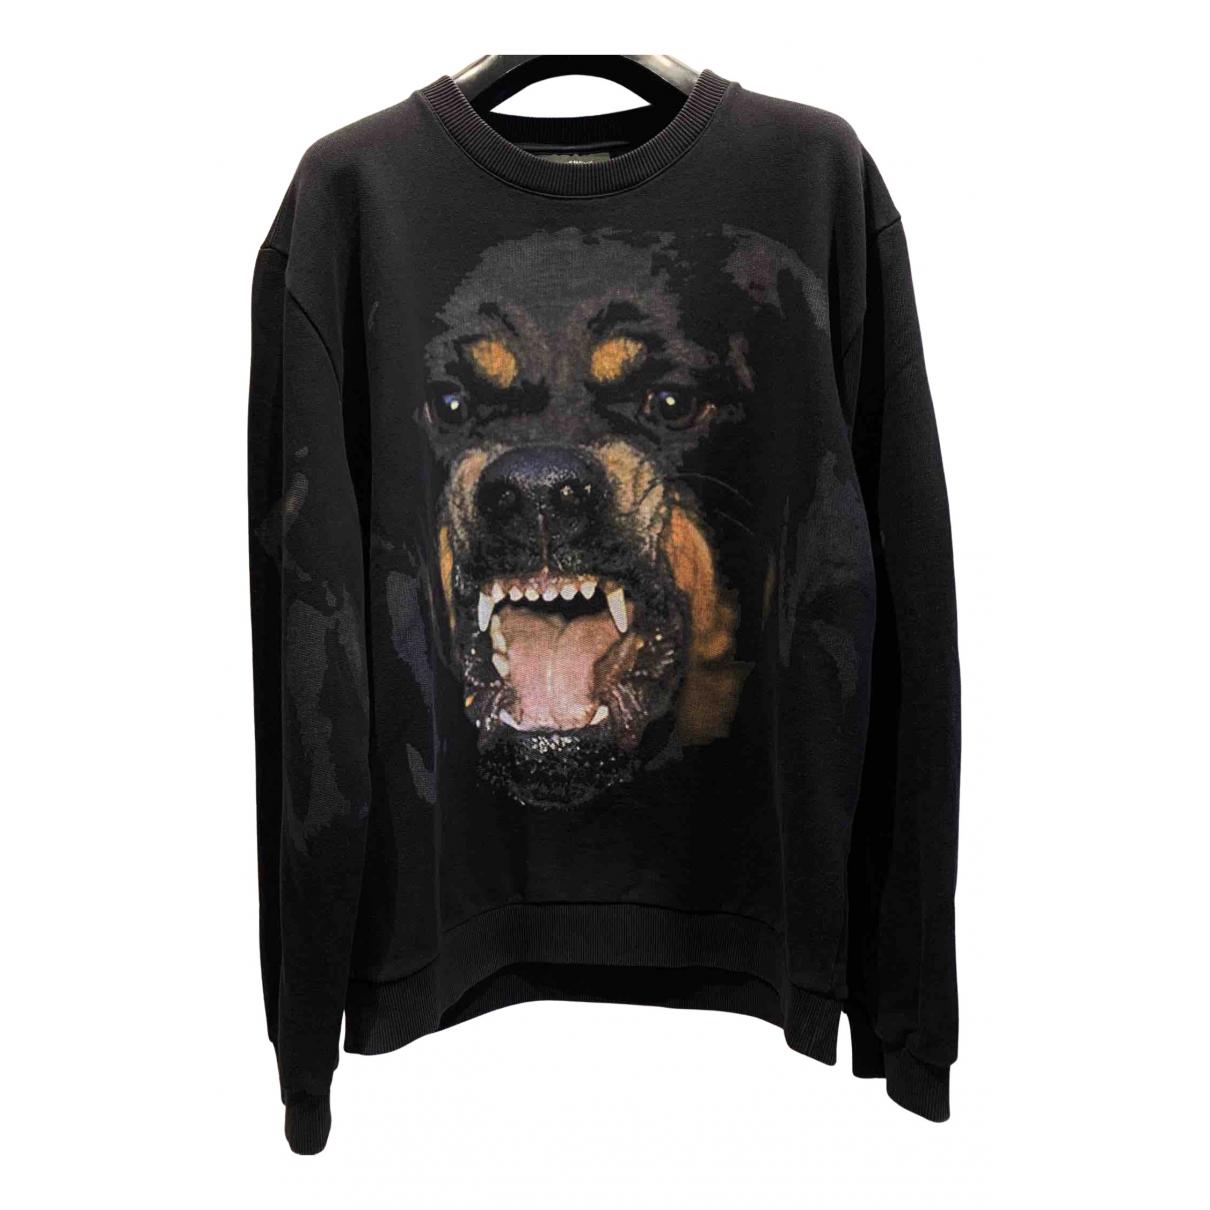 Givenchy N Black Cotton Knitwear & Sweatshirts for Men L International